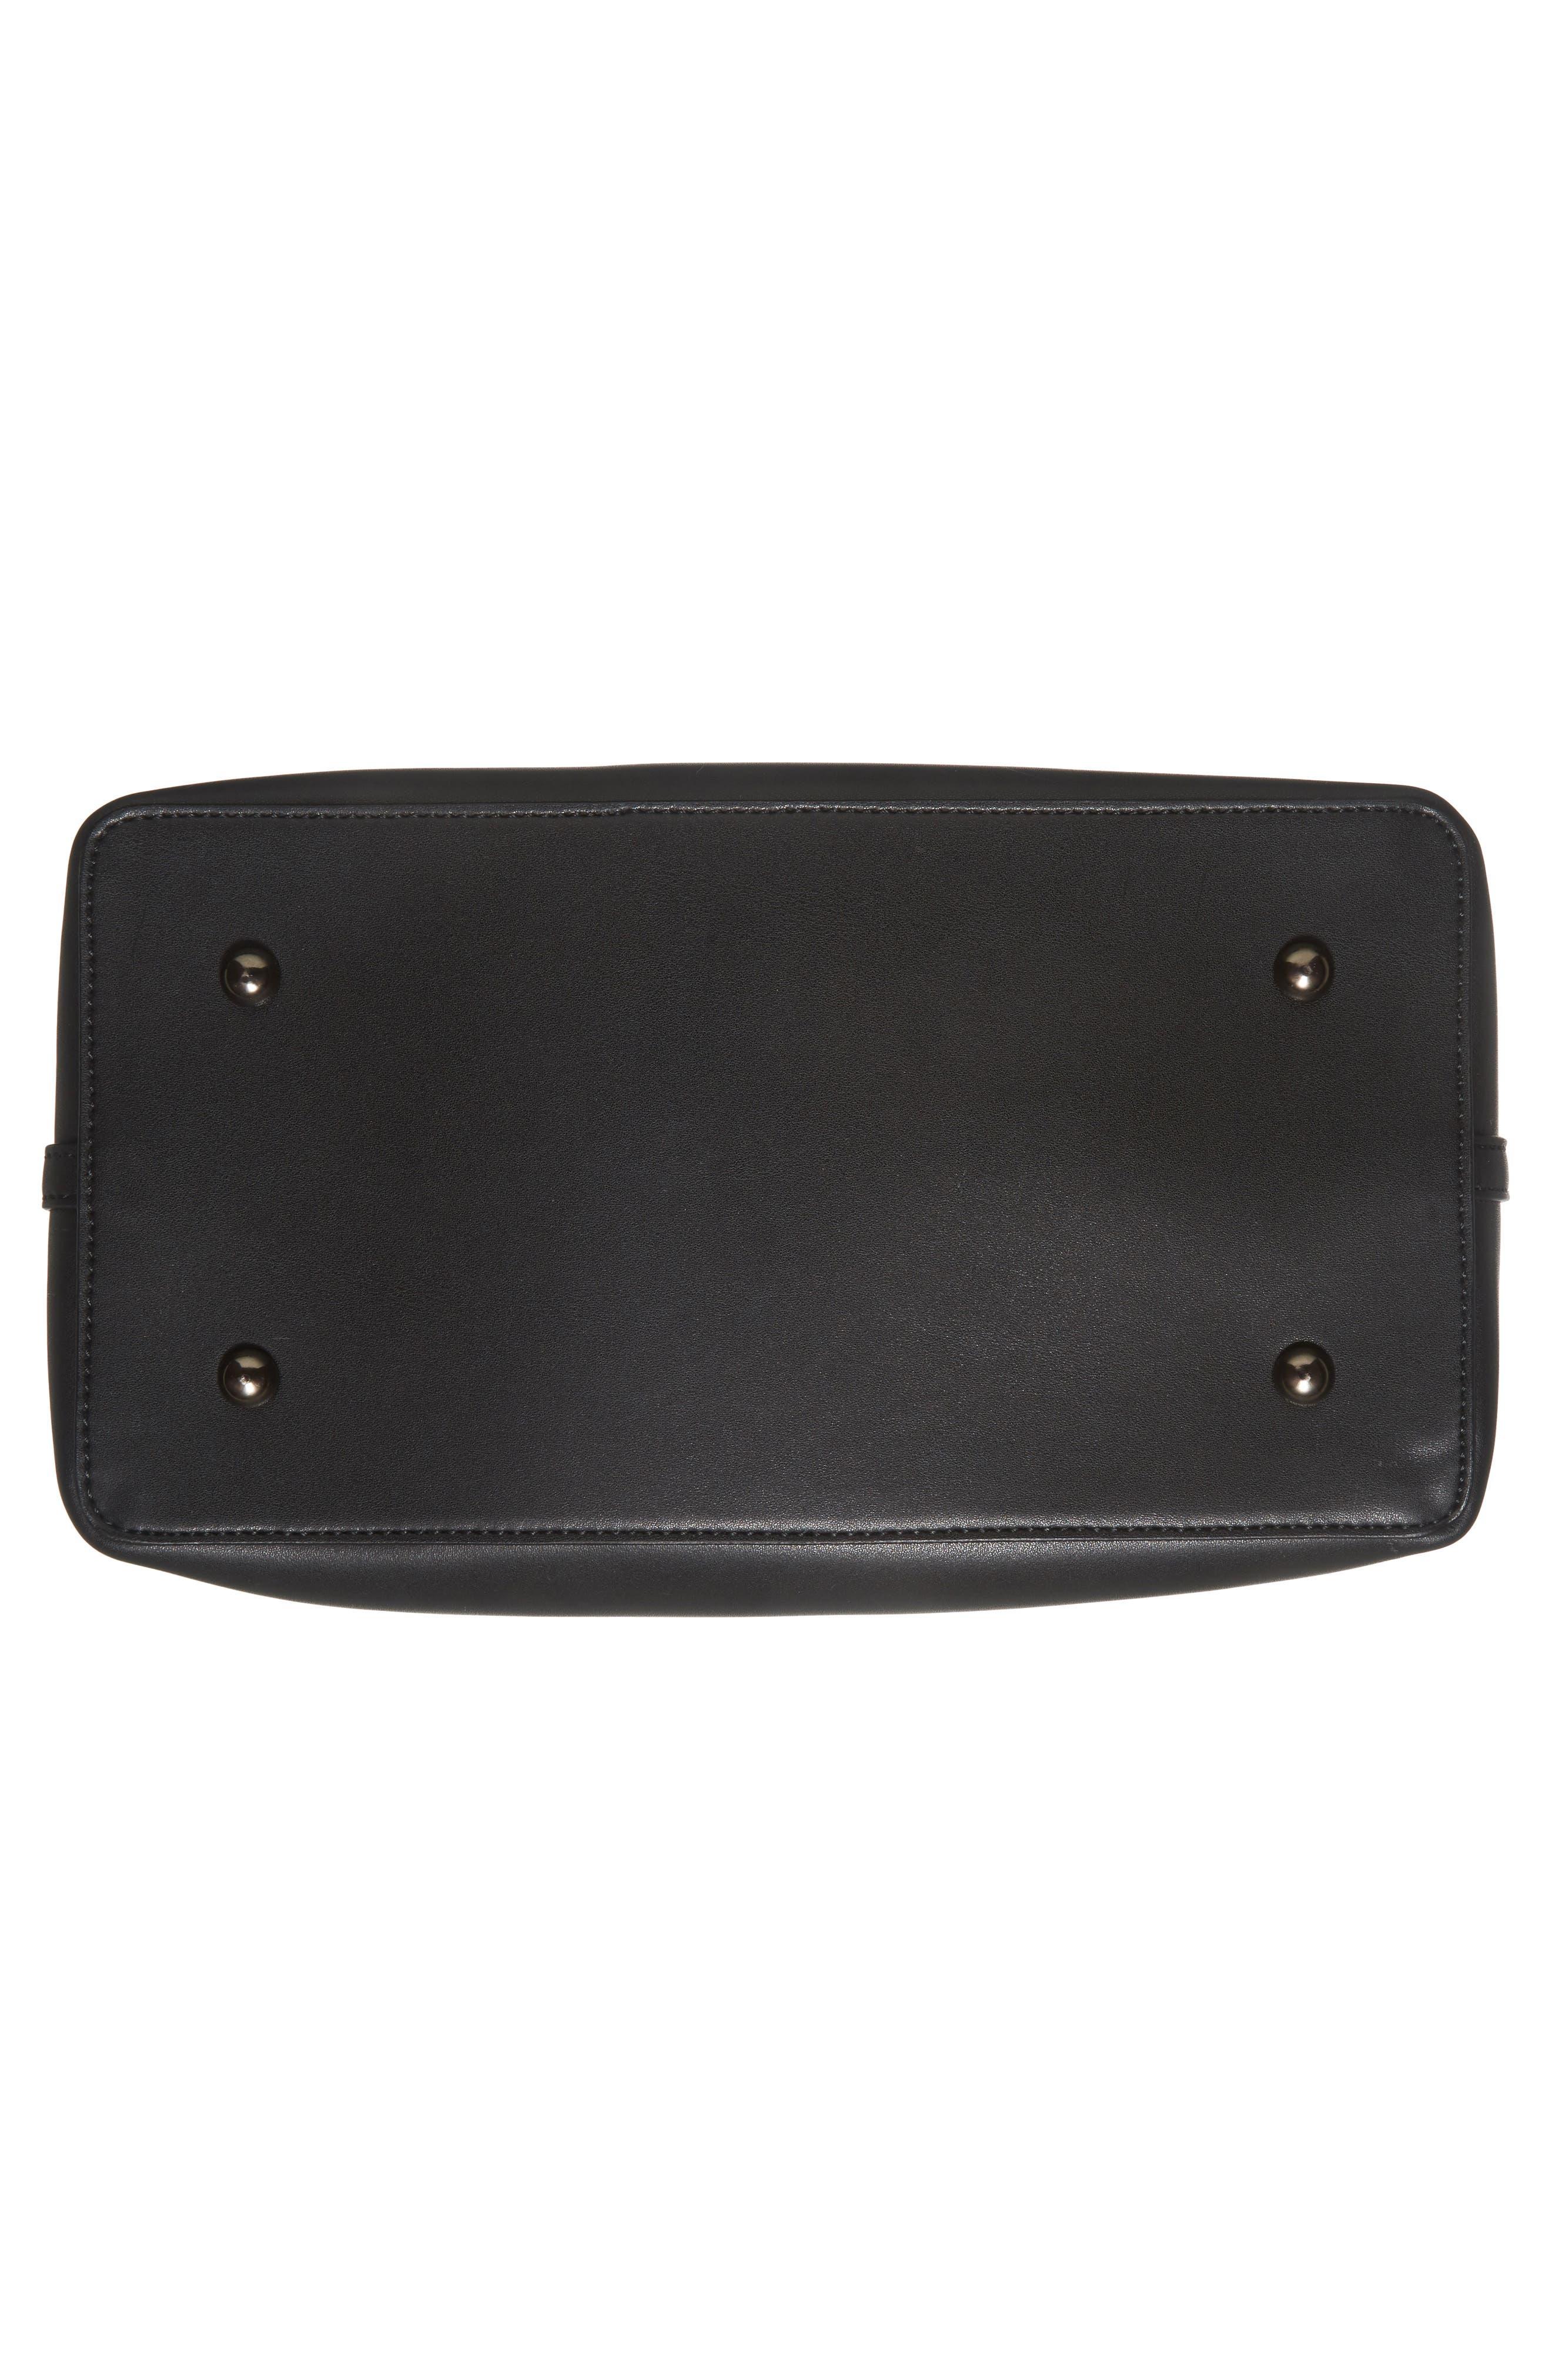 Raisin Leather Handbag,                             Alternate thumbnail 41, color,